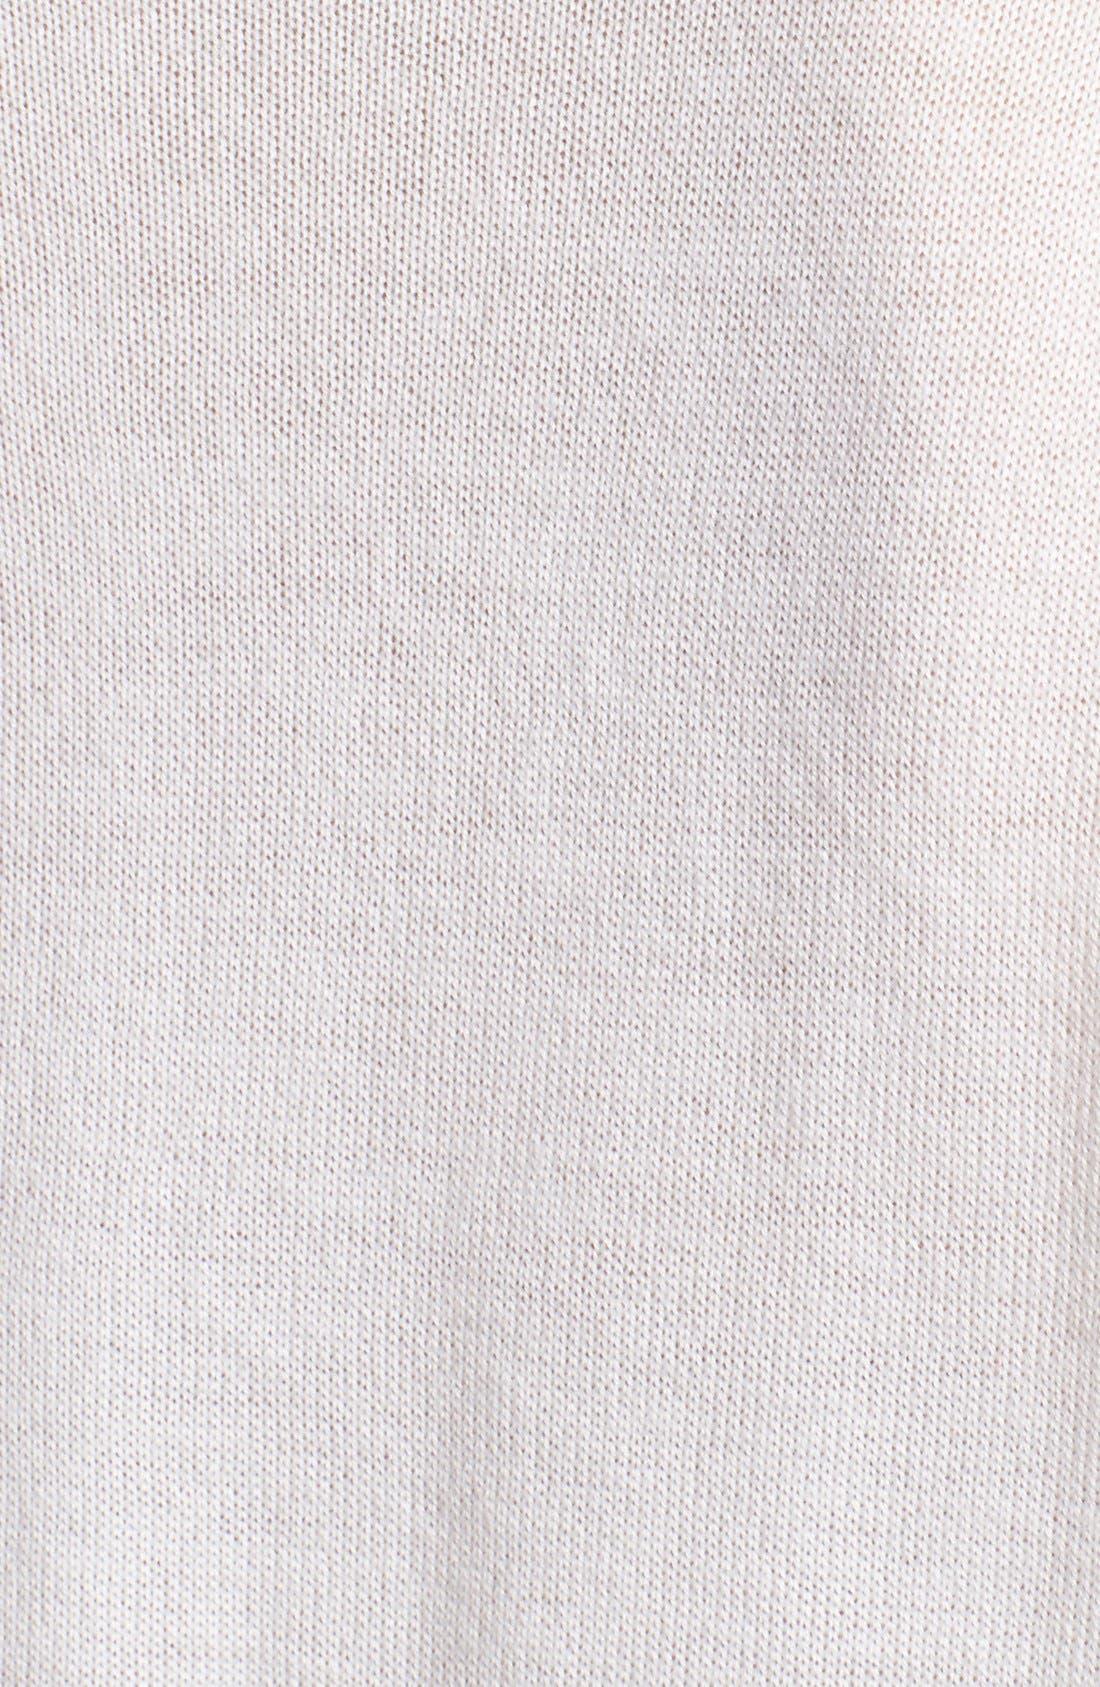 Alternate Image 3  - Vince Camuto Ribbed Cowl Neck Tunic (Regular & Petite)